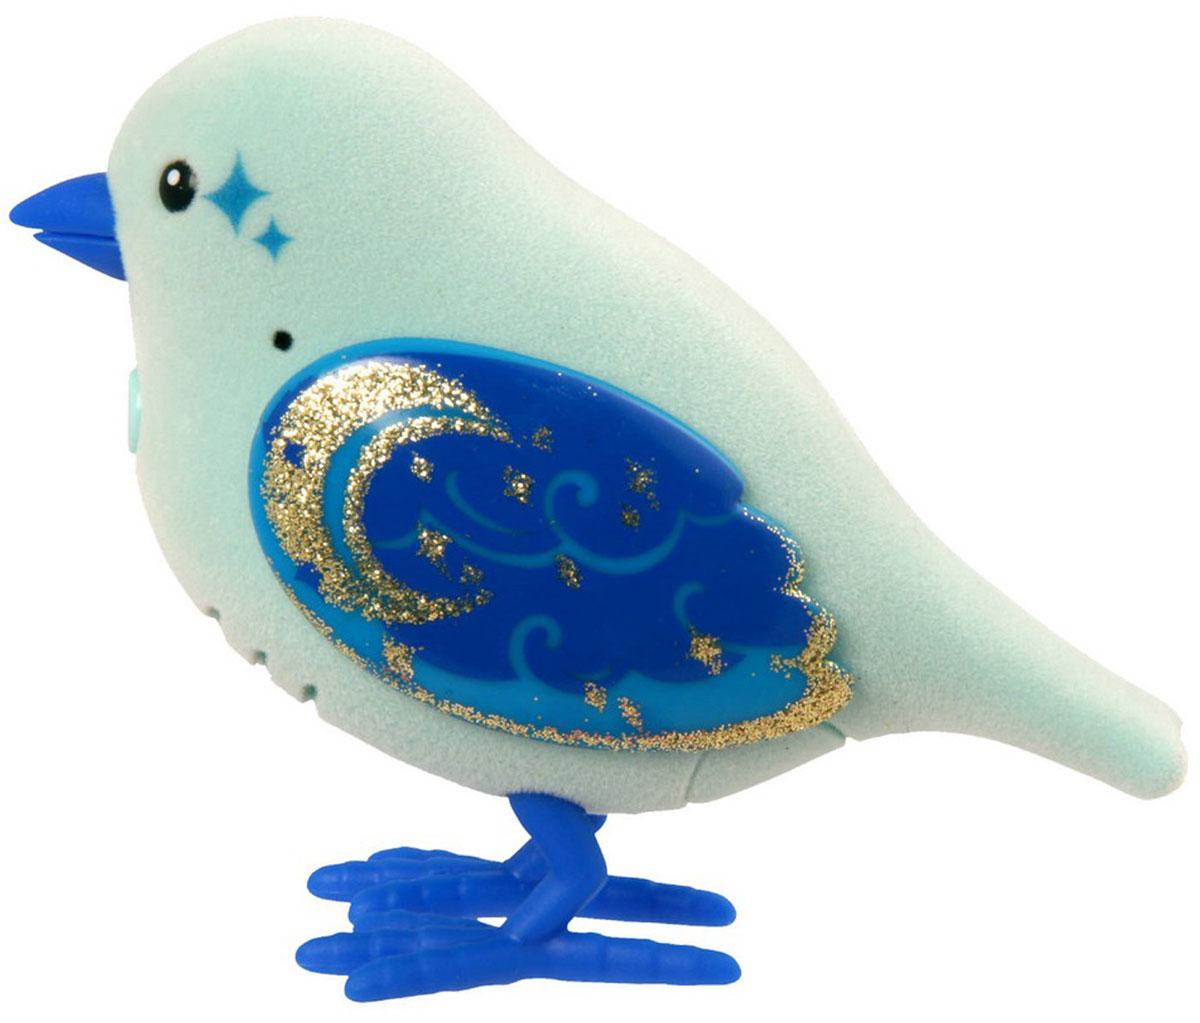 Little Live Pets Moose Интерактивная игрушка Говорящая птичка Molly Moonbeam 28225/ast28222 (28224, 28225, 28226, 28227, 28228, 28229)